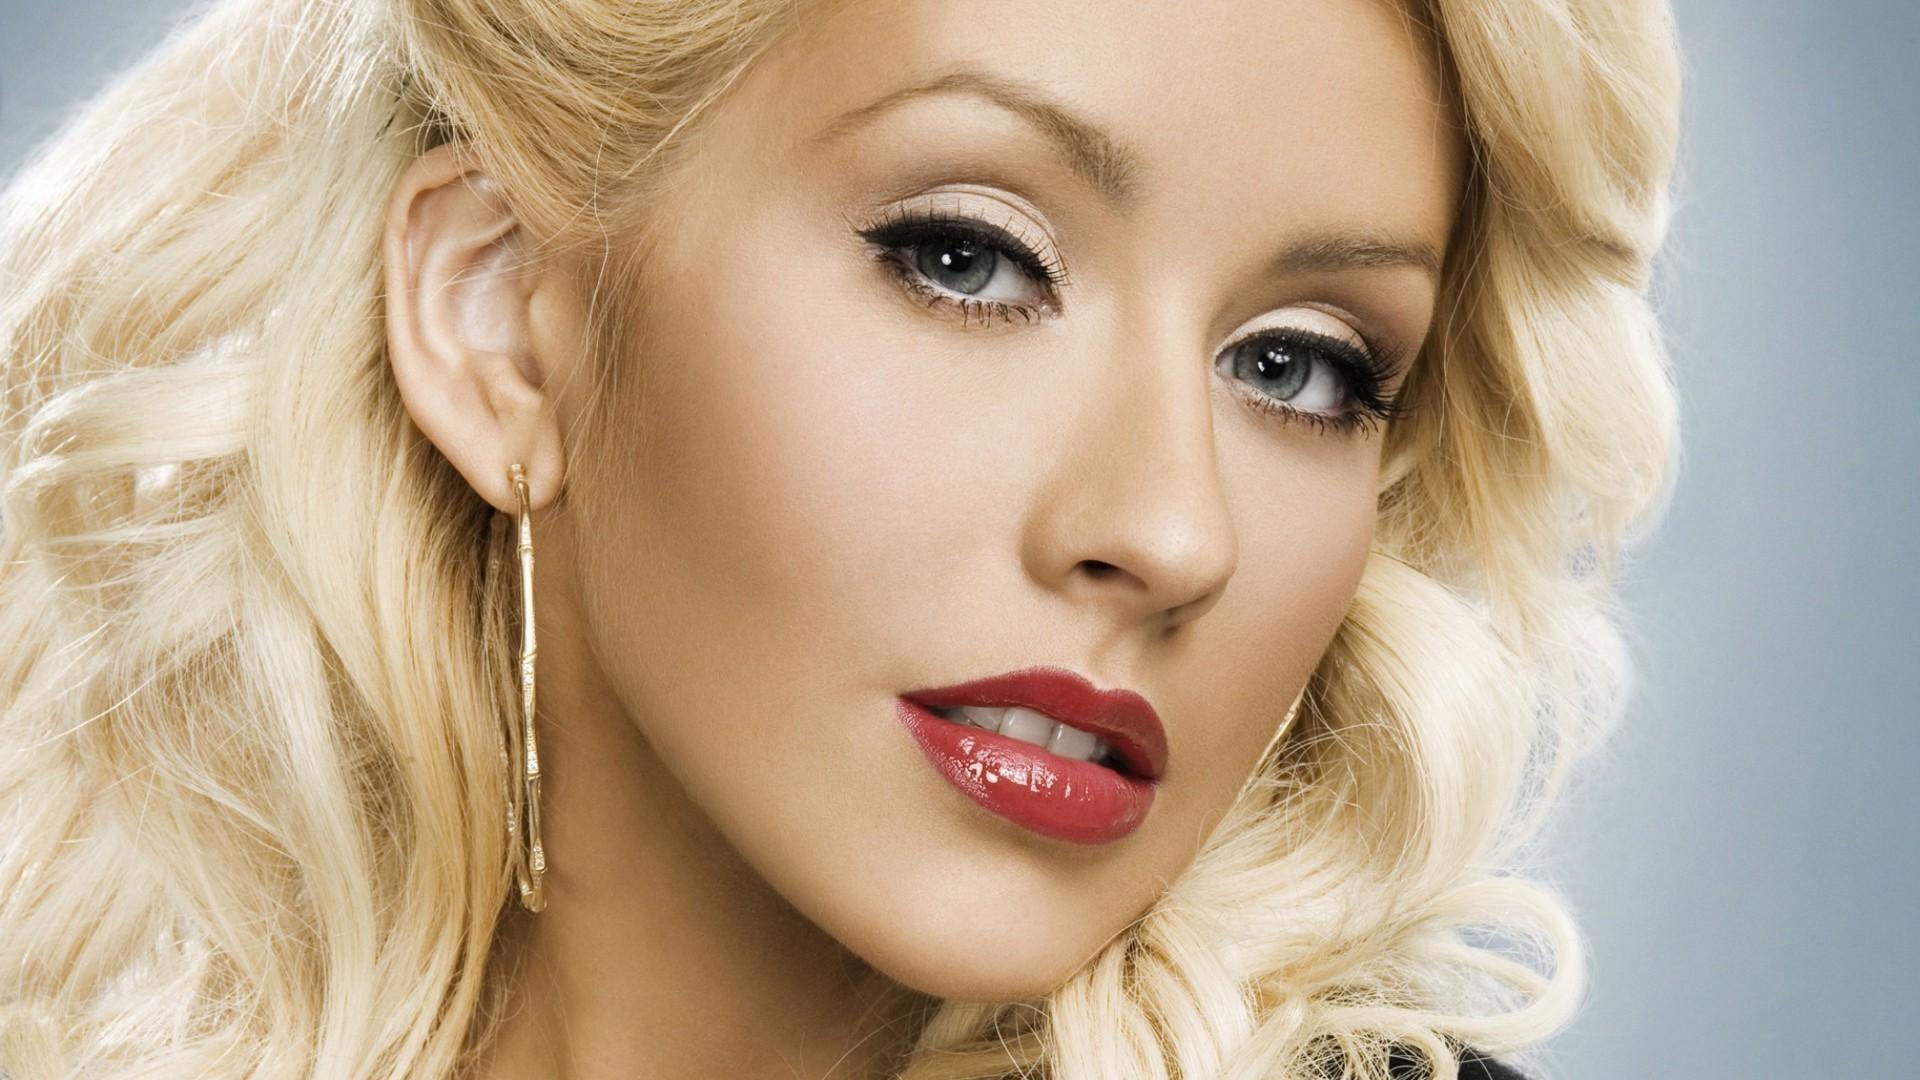 Christina Aguilera wallpaper 3850 1920x1080